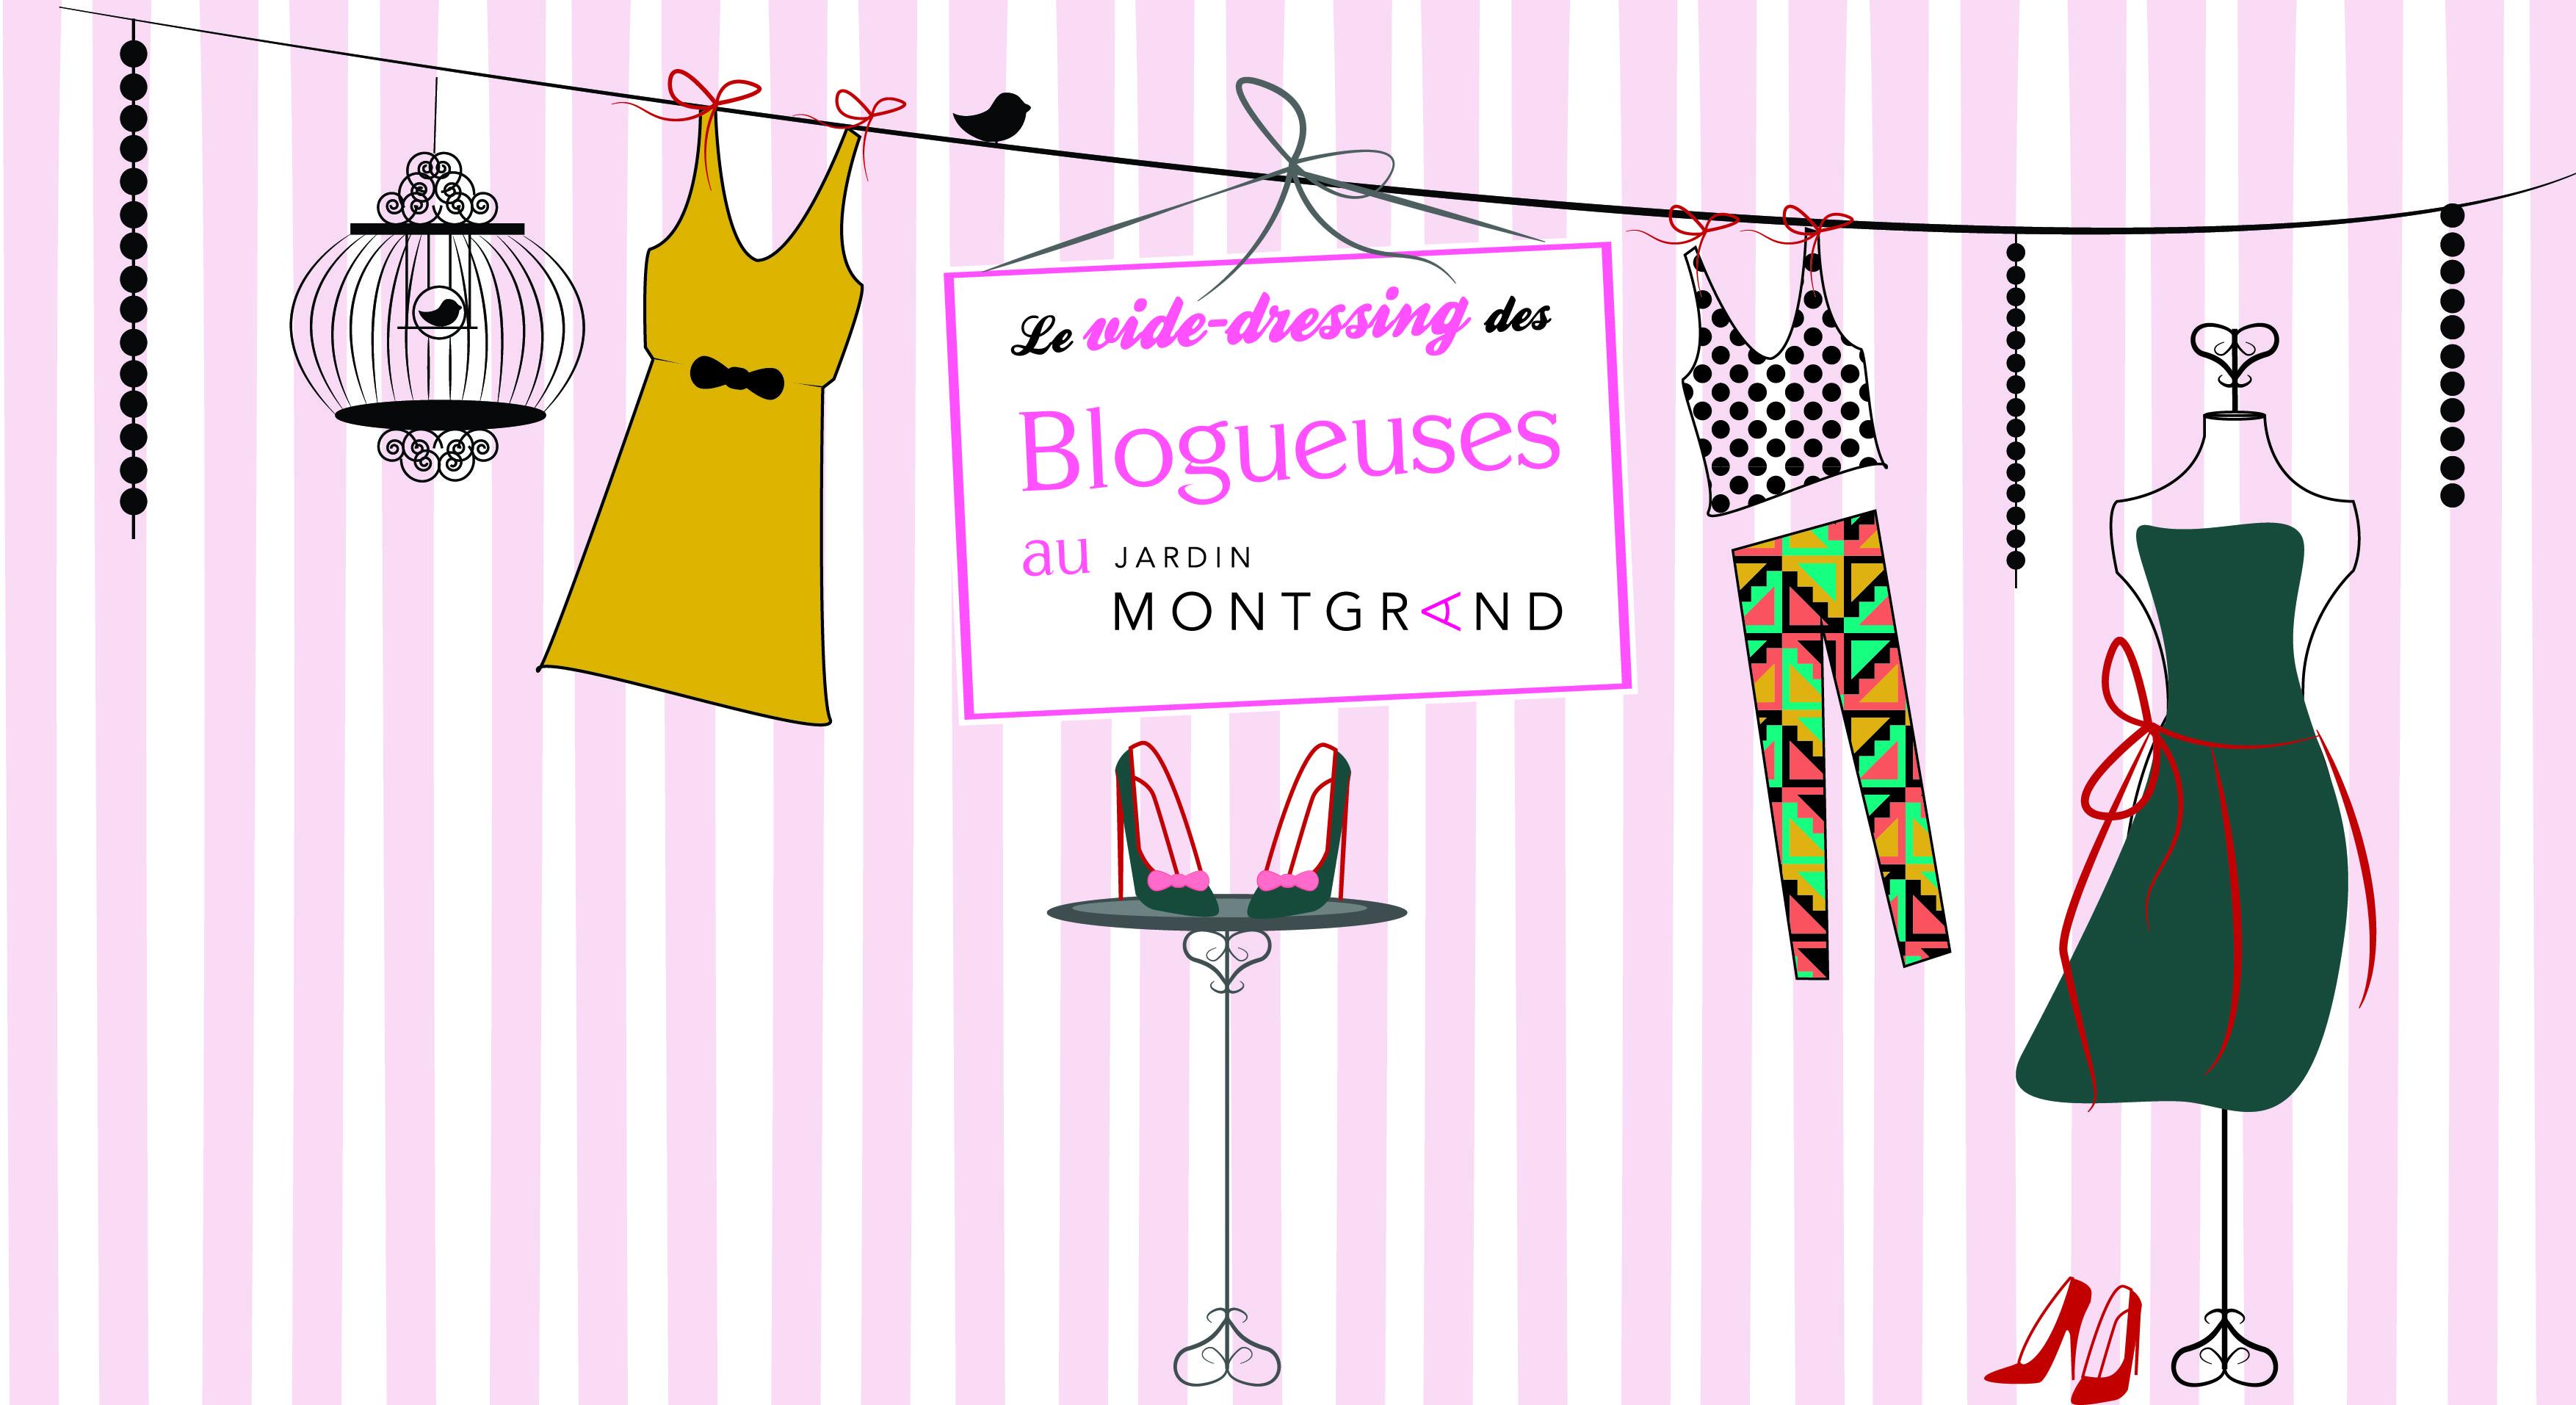 vide dressingdes blogueuses marseille